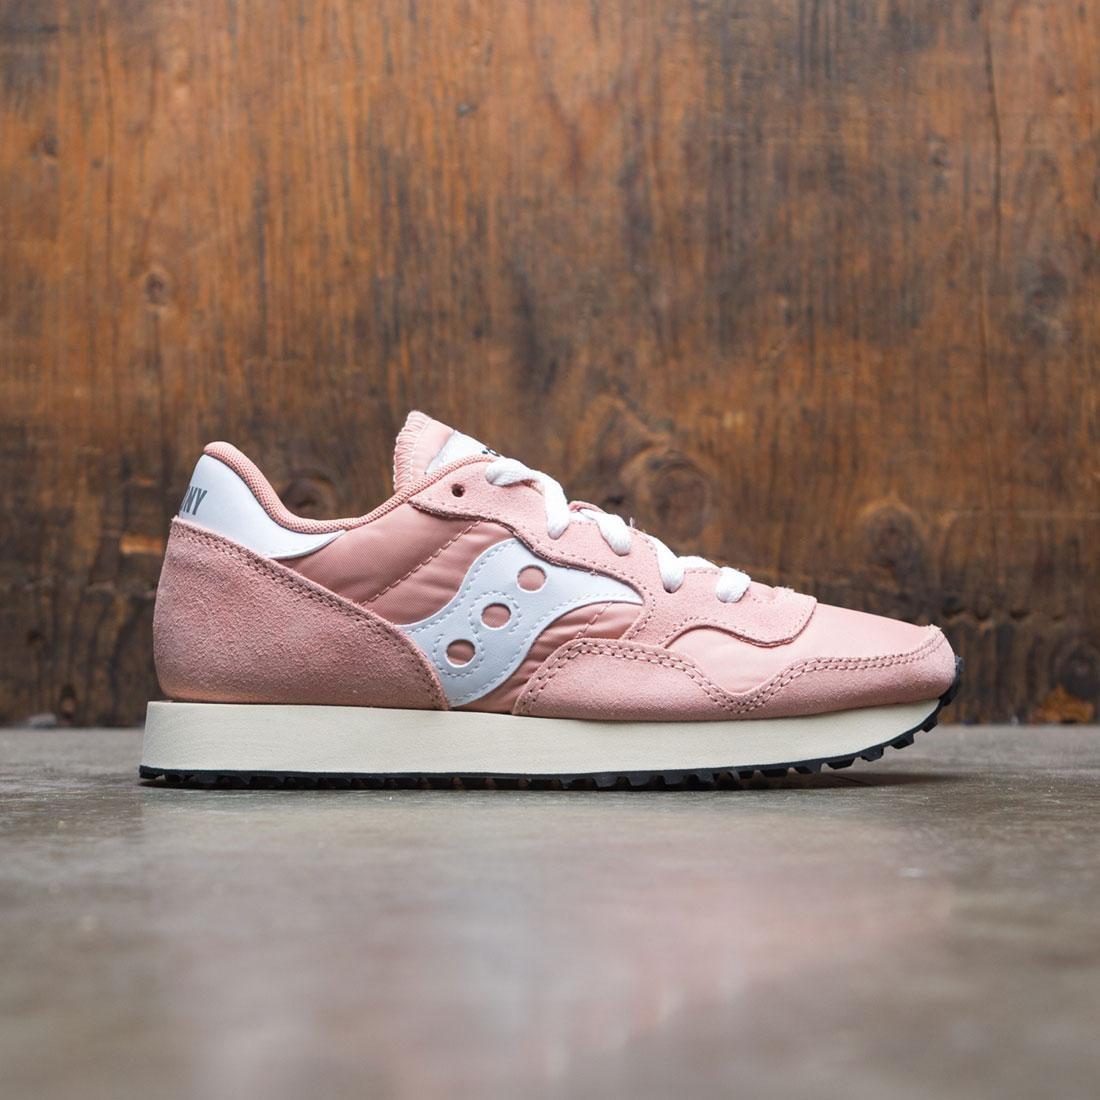 Saucony Women DXN Trainer Vintage pink